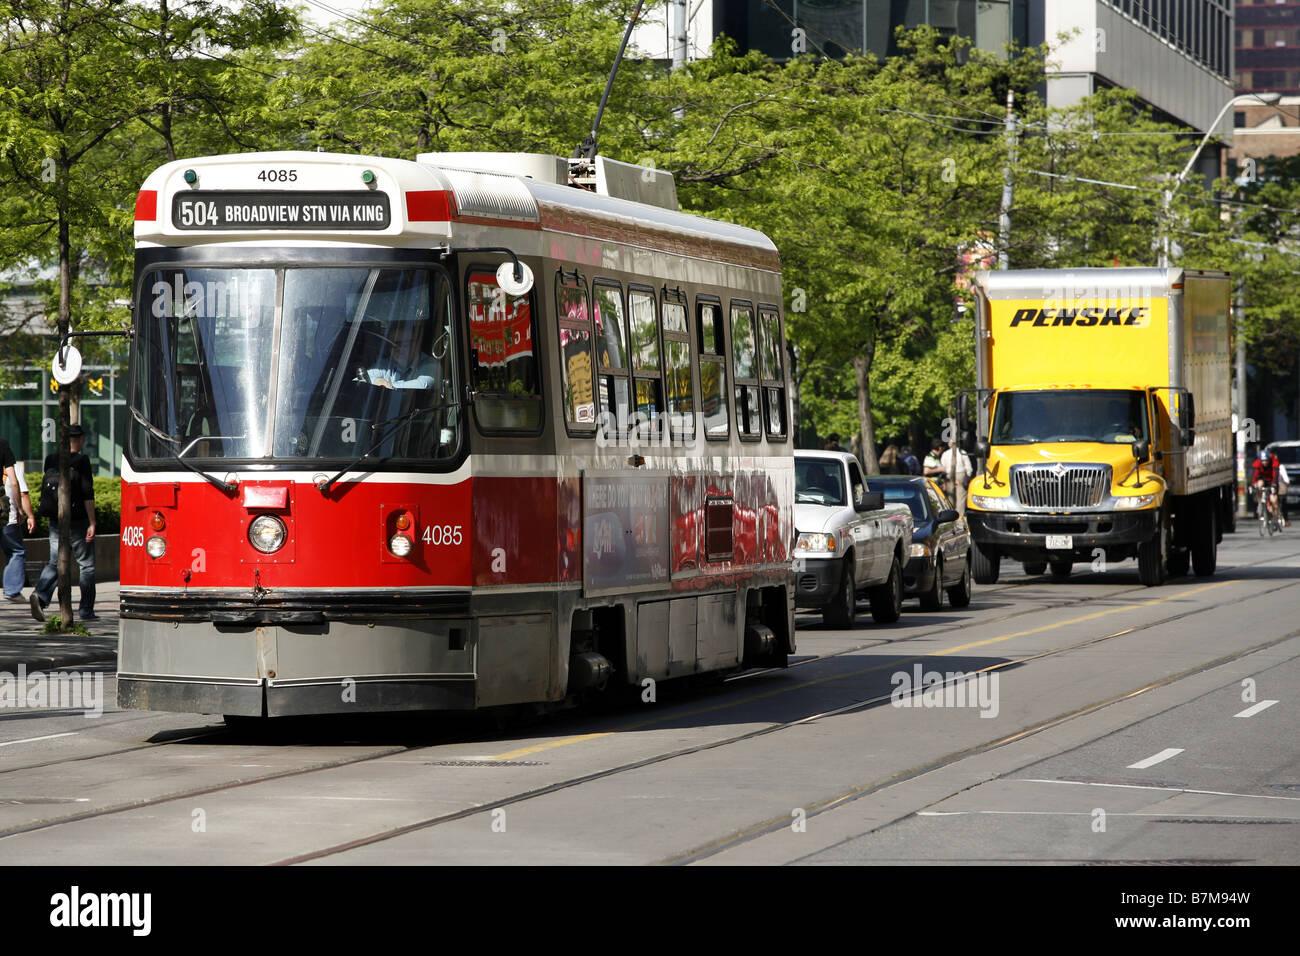 Streetcar, Toronto, Ontario, Canada - Stock Image